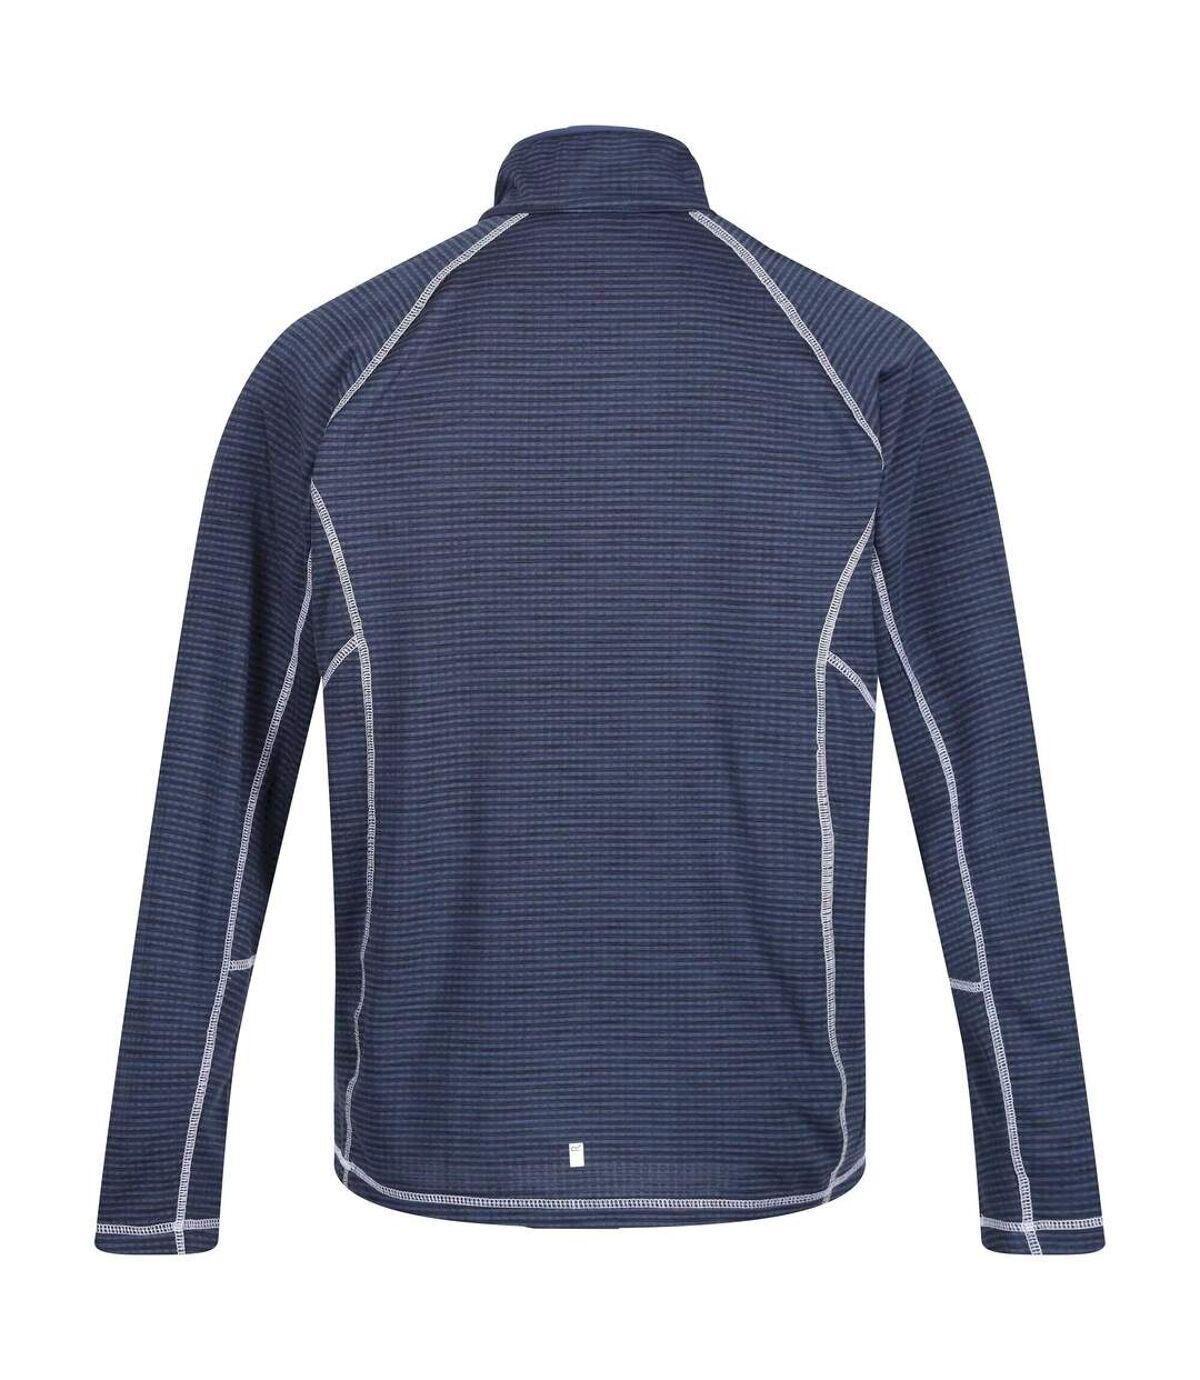 Regatta Mens Yonder Quick Dry Moisture Wicking Half Zip Fleece Jacket (True Red) - UTRG3786